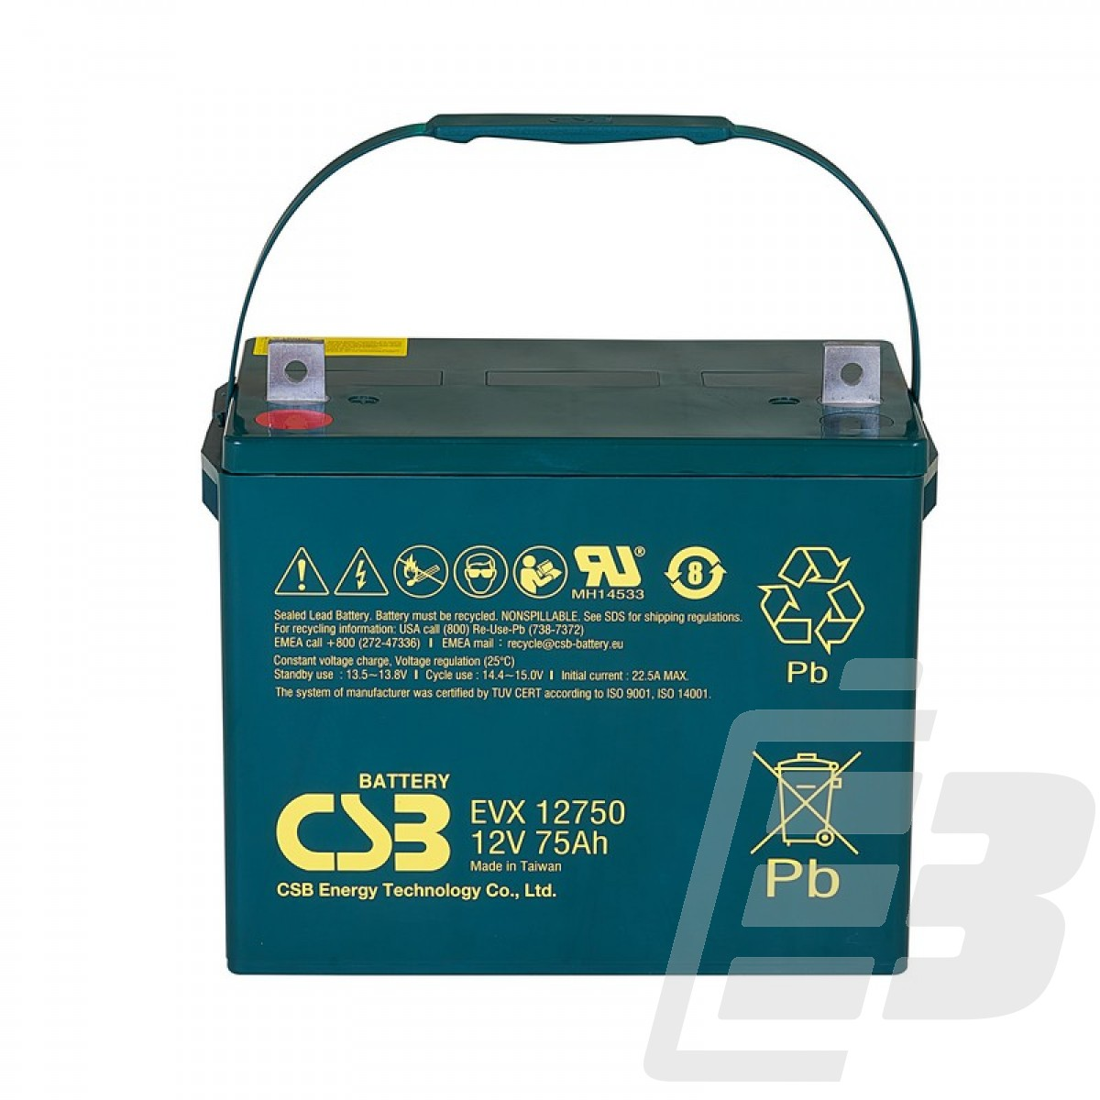 CSB Lead Acid Battery EVX12750 1